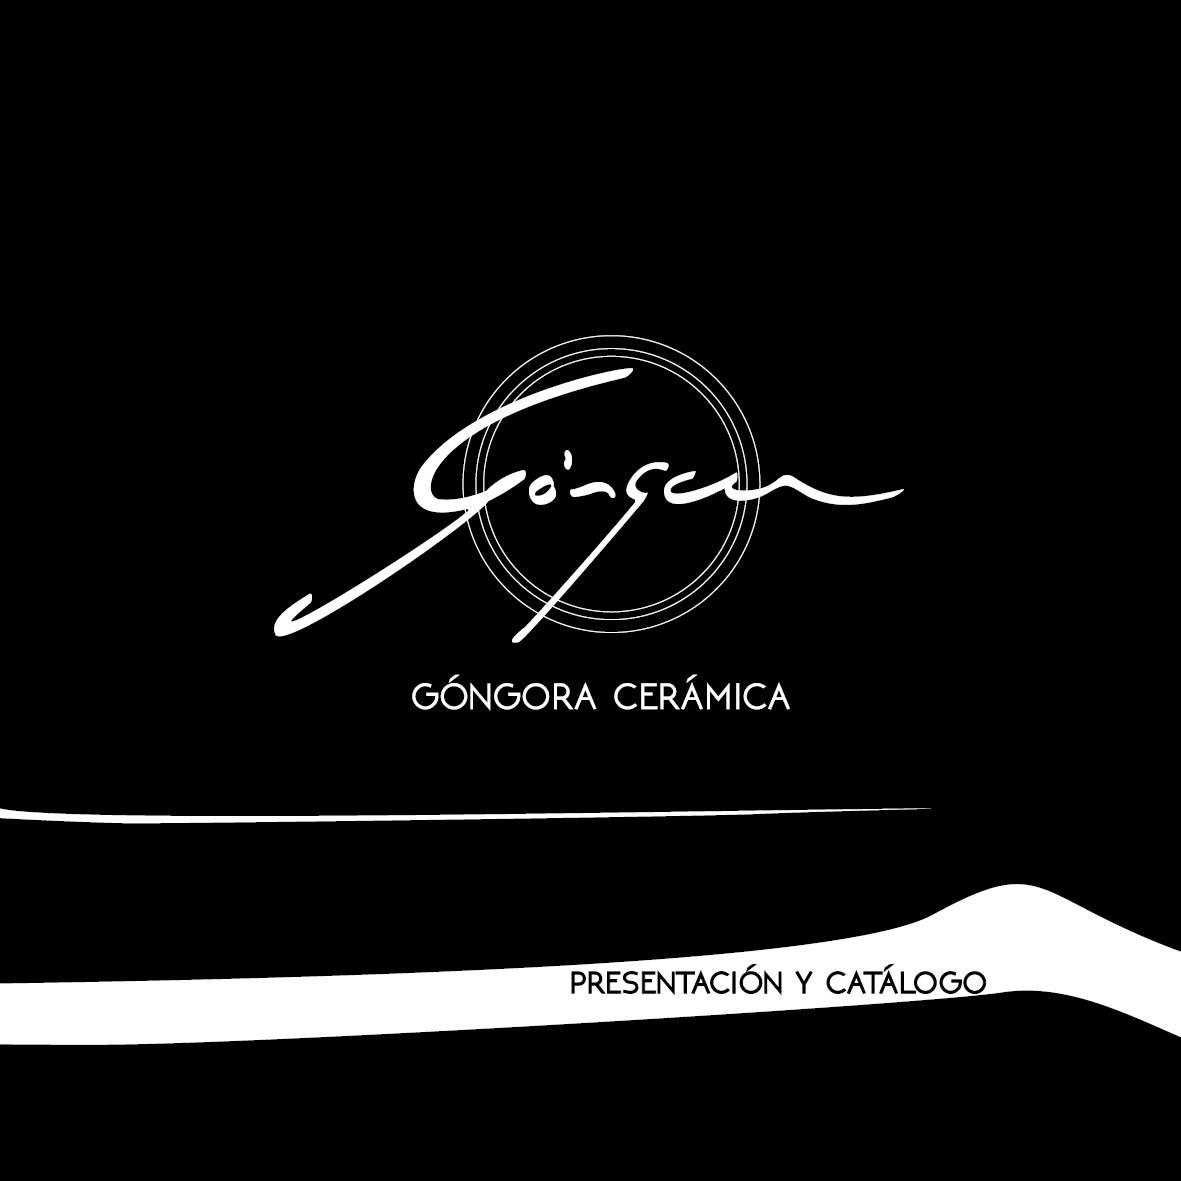 GongoraCeramica_Catalogo.jpg